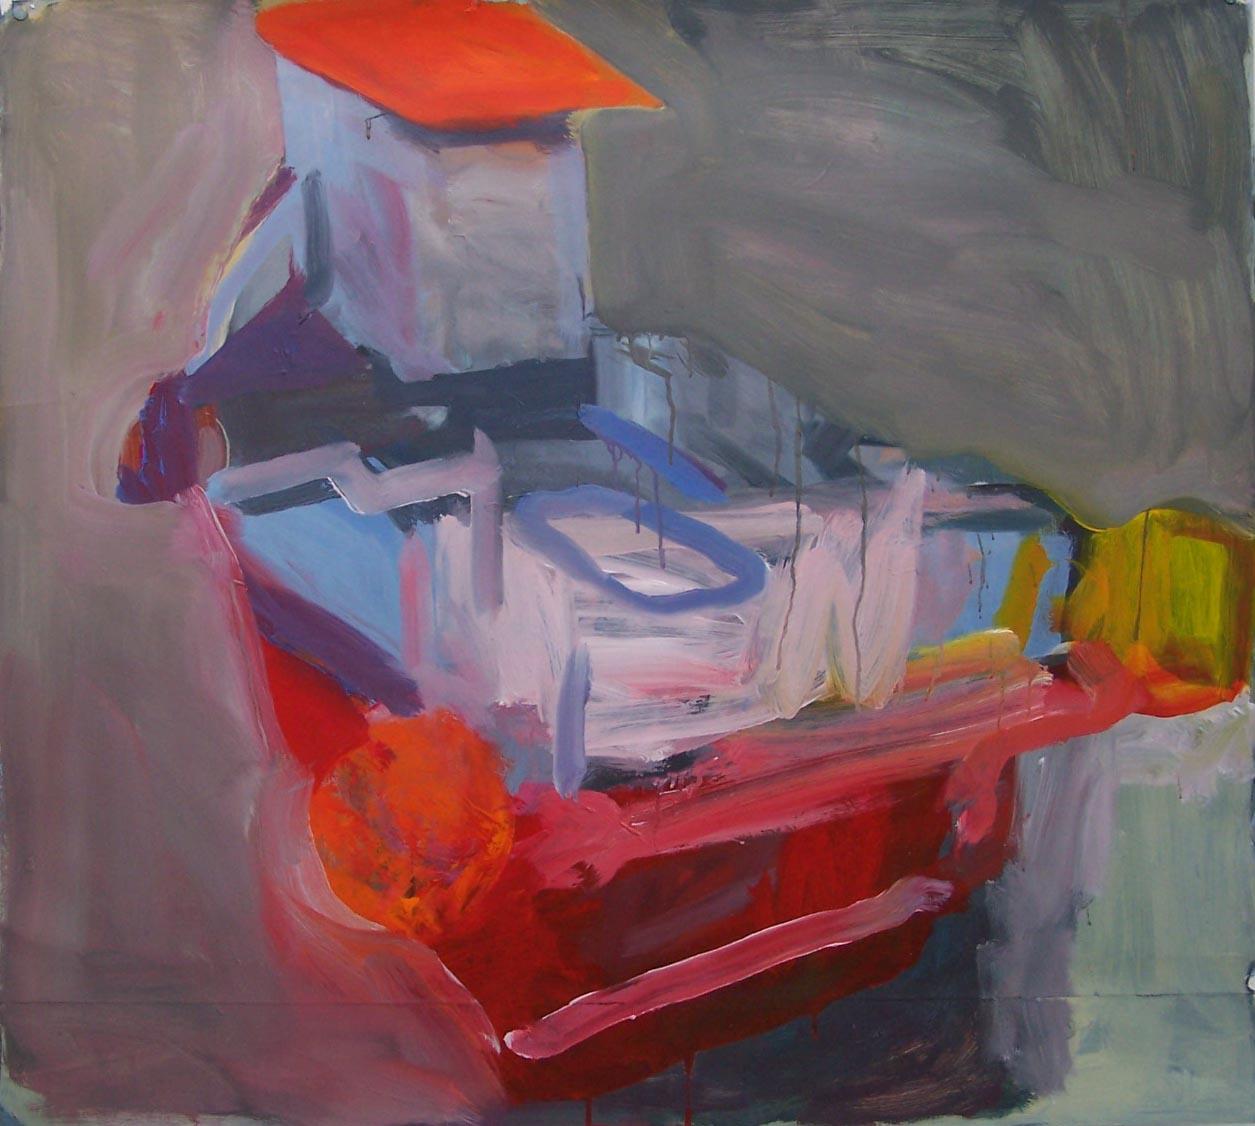 Red Trawler, 2006